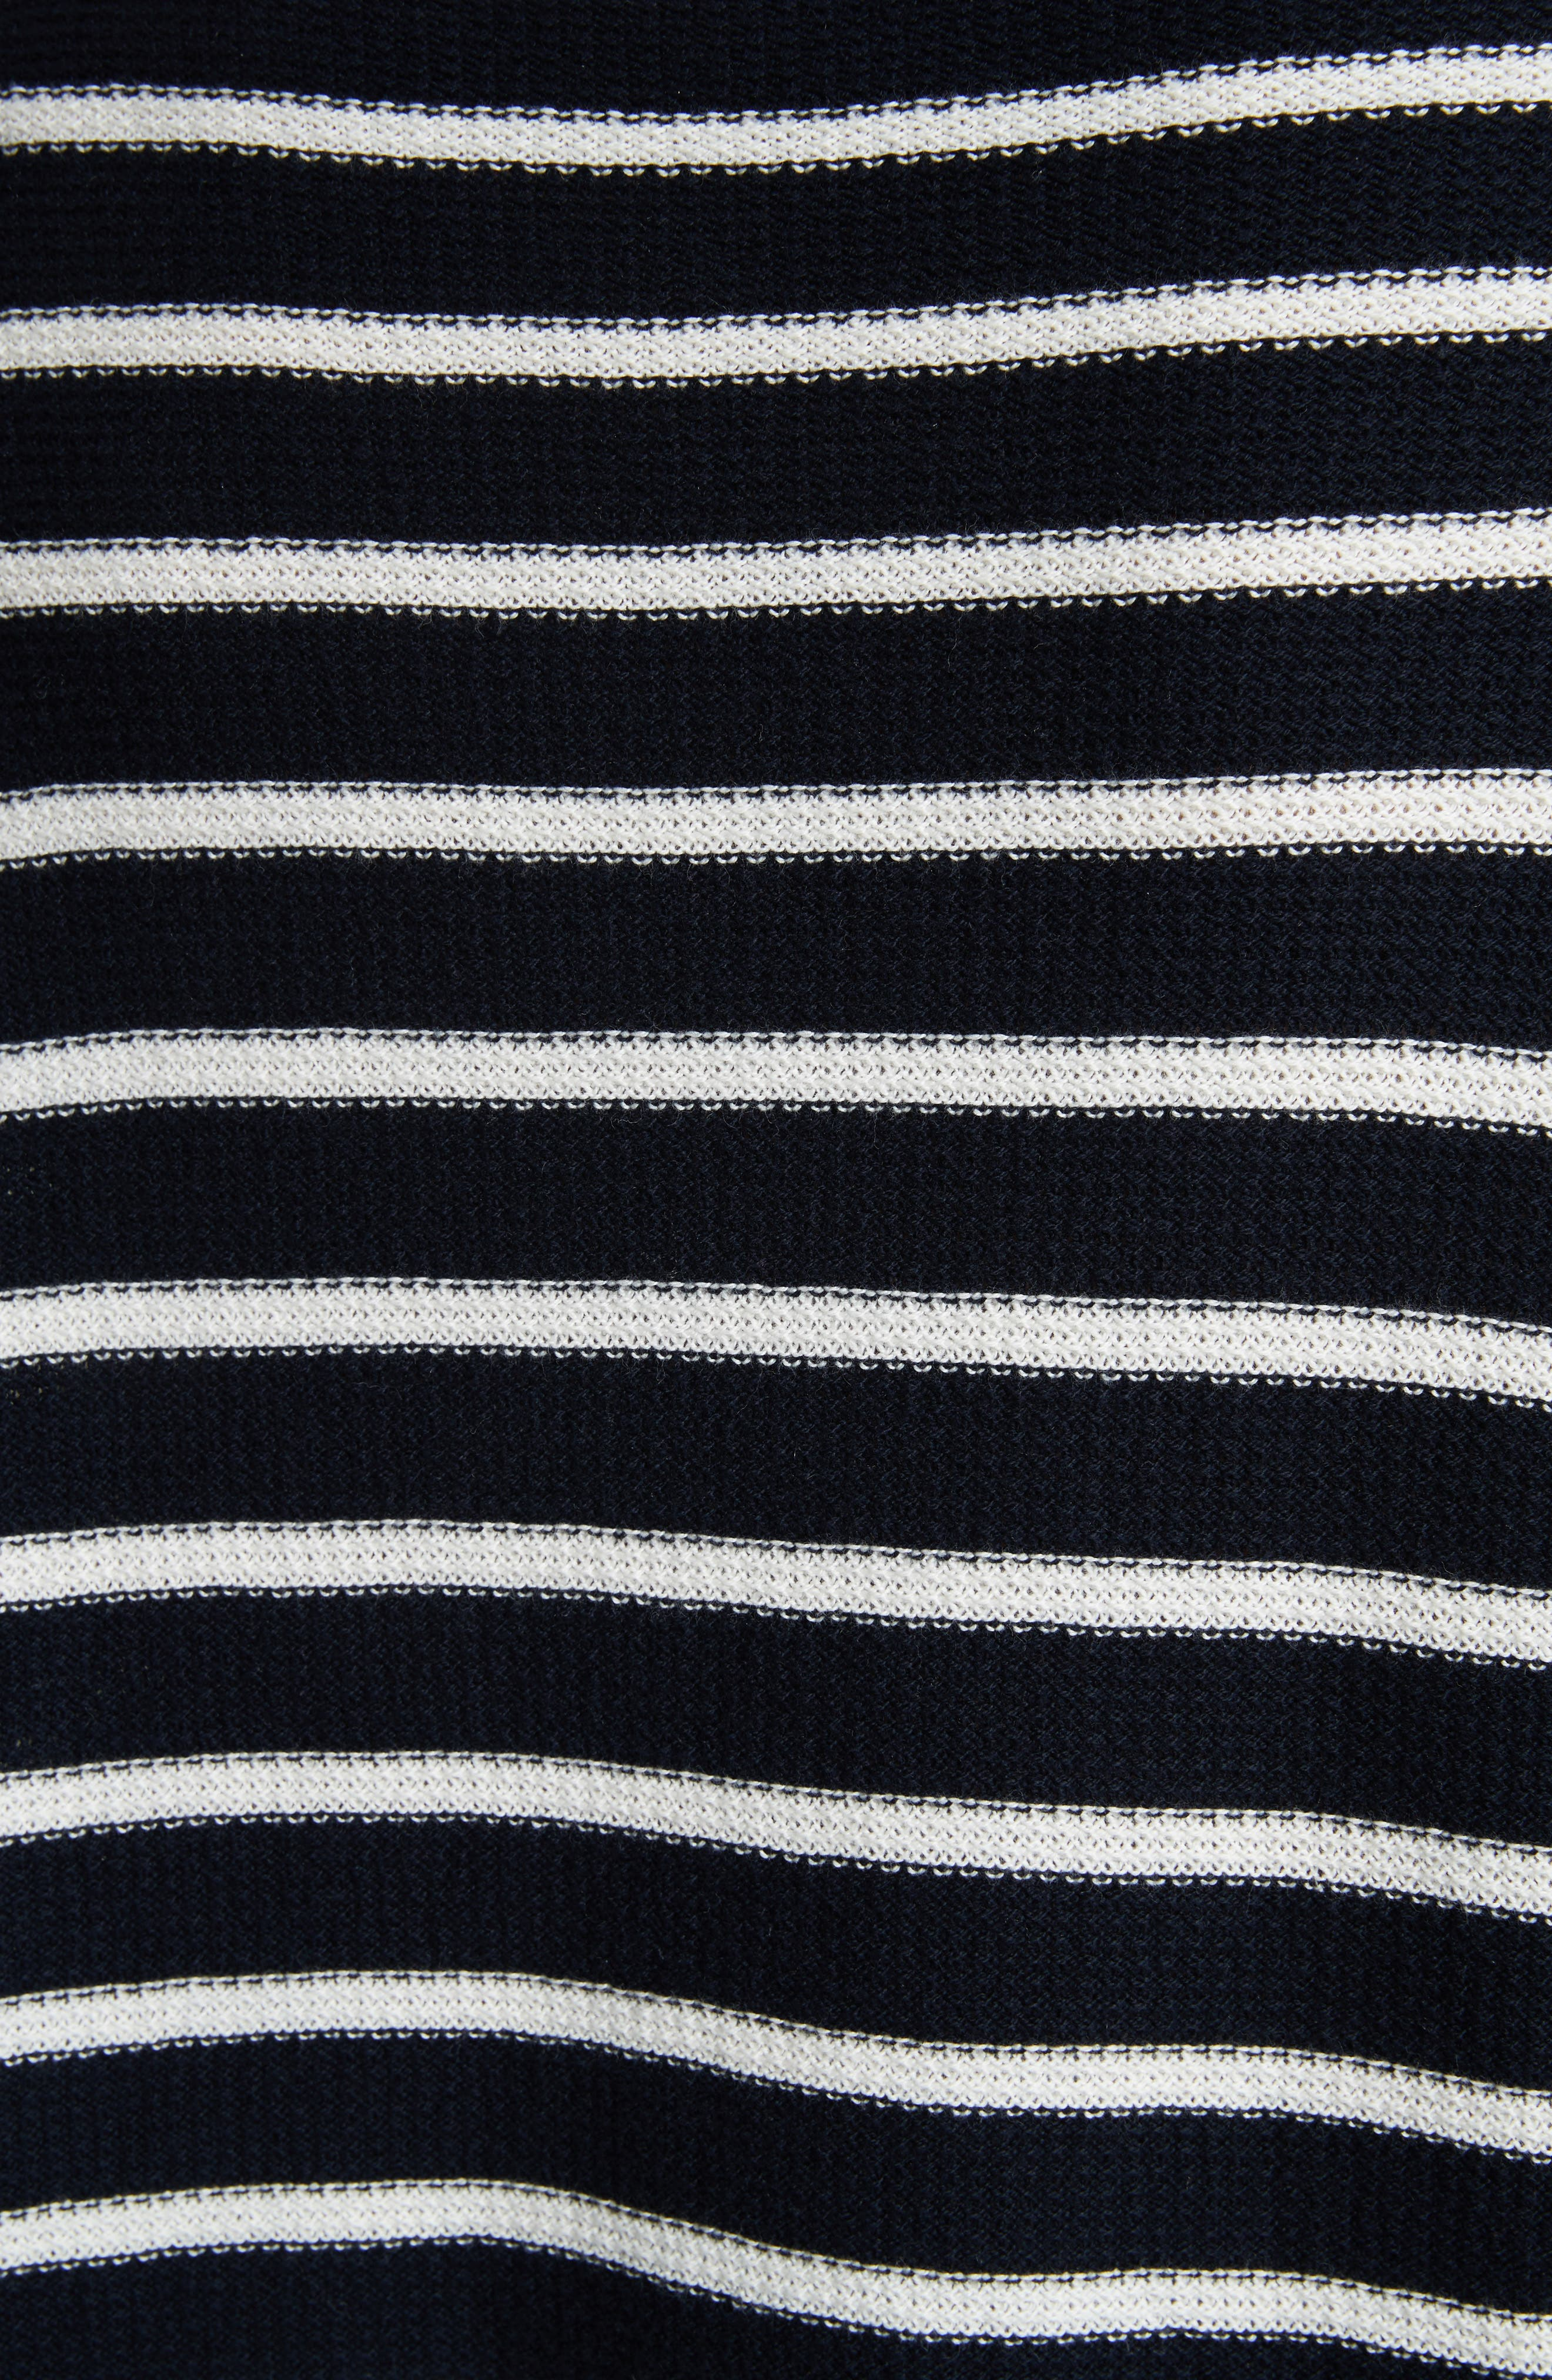 Stripe Waffle Knit Top,                             Alternate thumbnail 5, color,                             Coastal/ Optic White